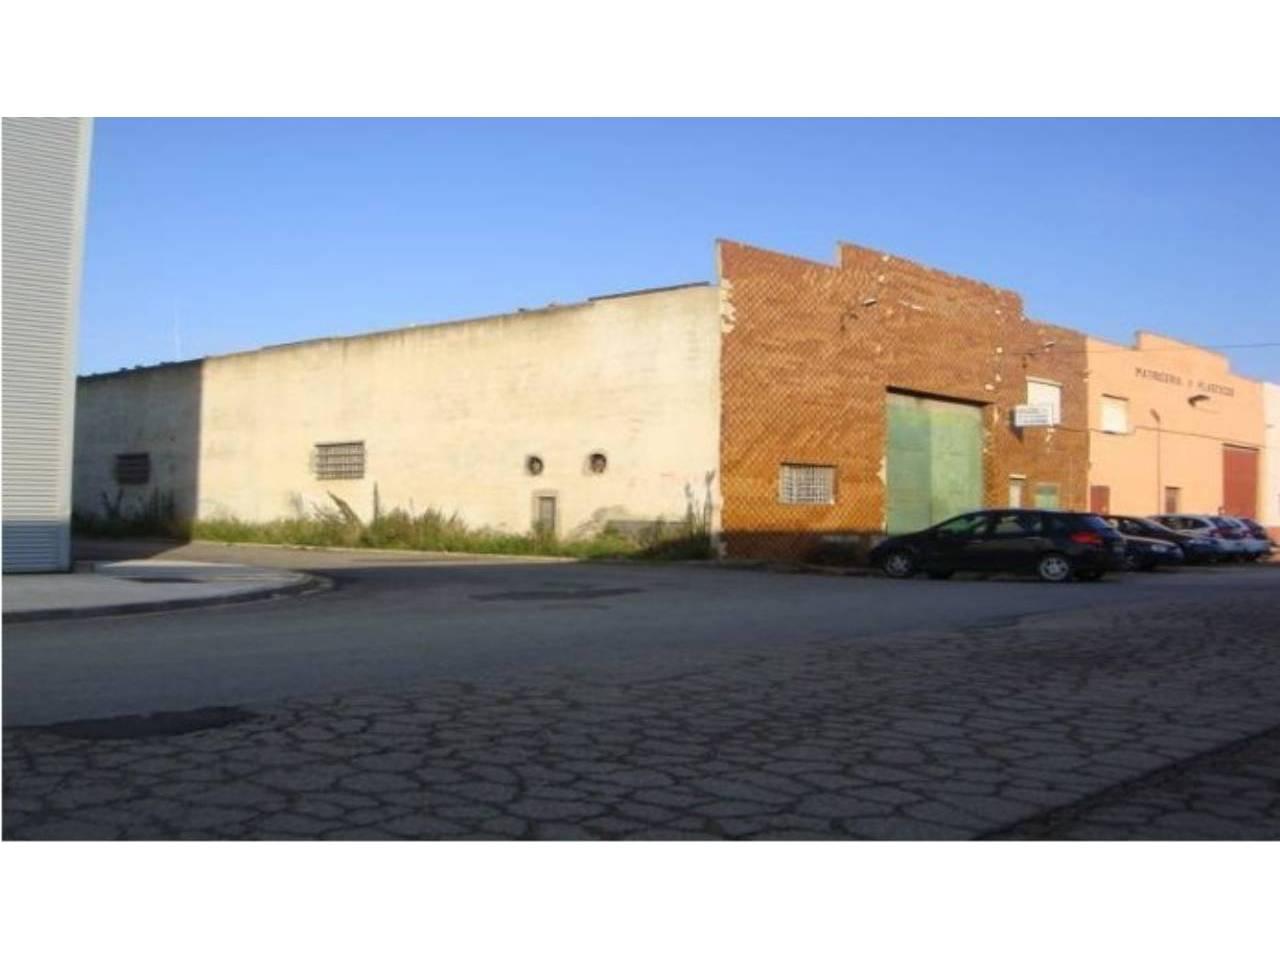 Bâtiment à usage industriel  Albal. Superf. 862 m², 862 m² solar,  2 , trastero, garaje, estado cert